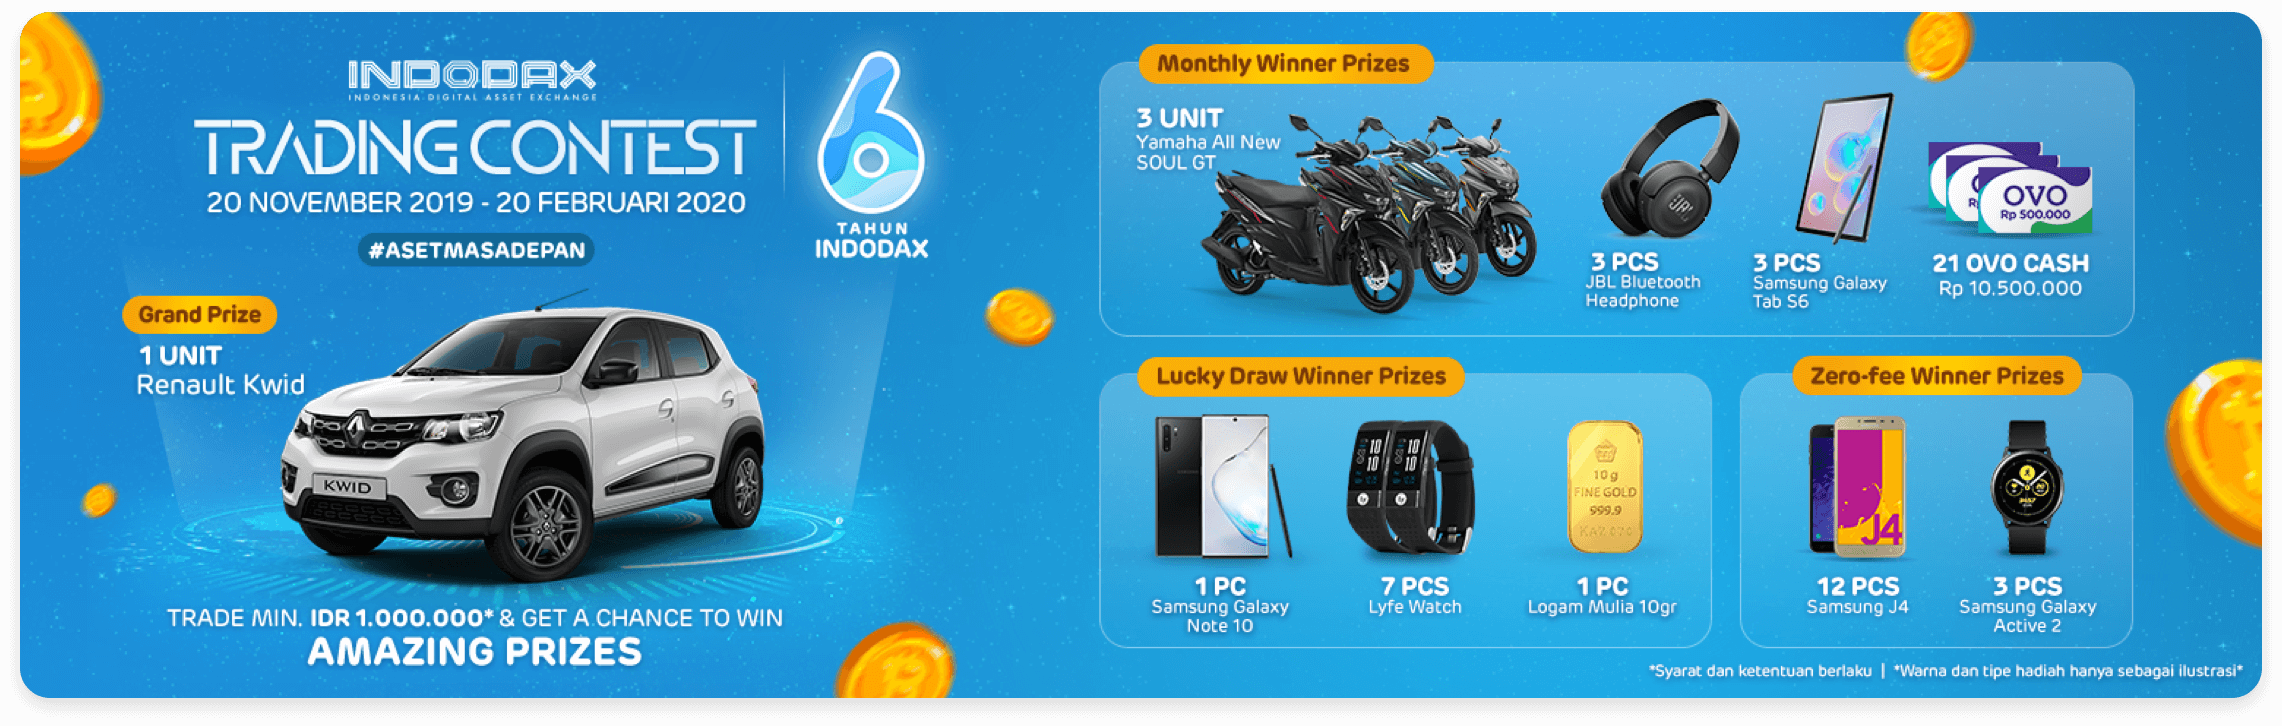 Indodax Trading Contest